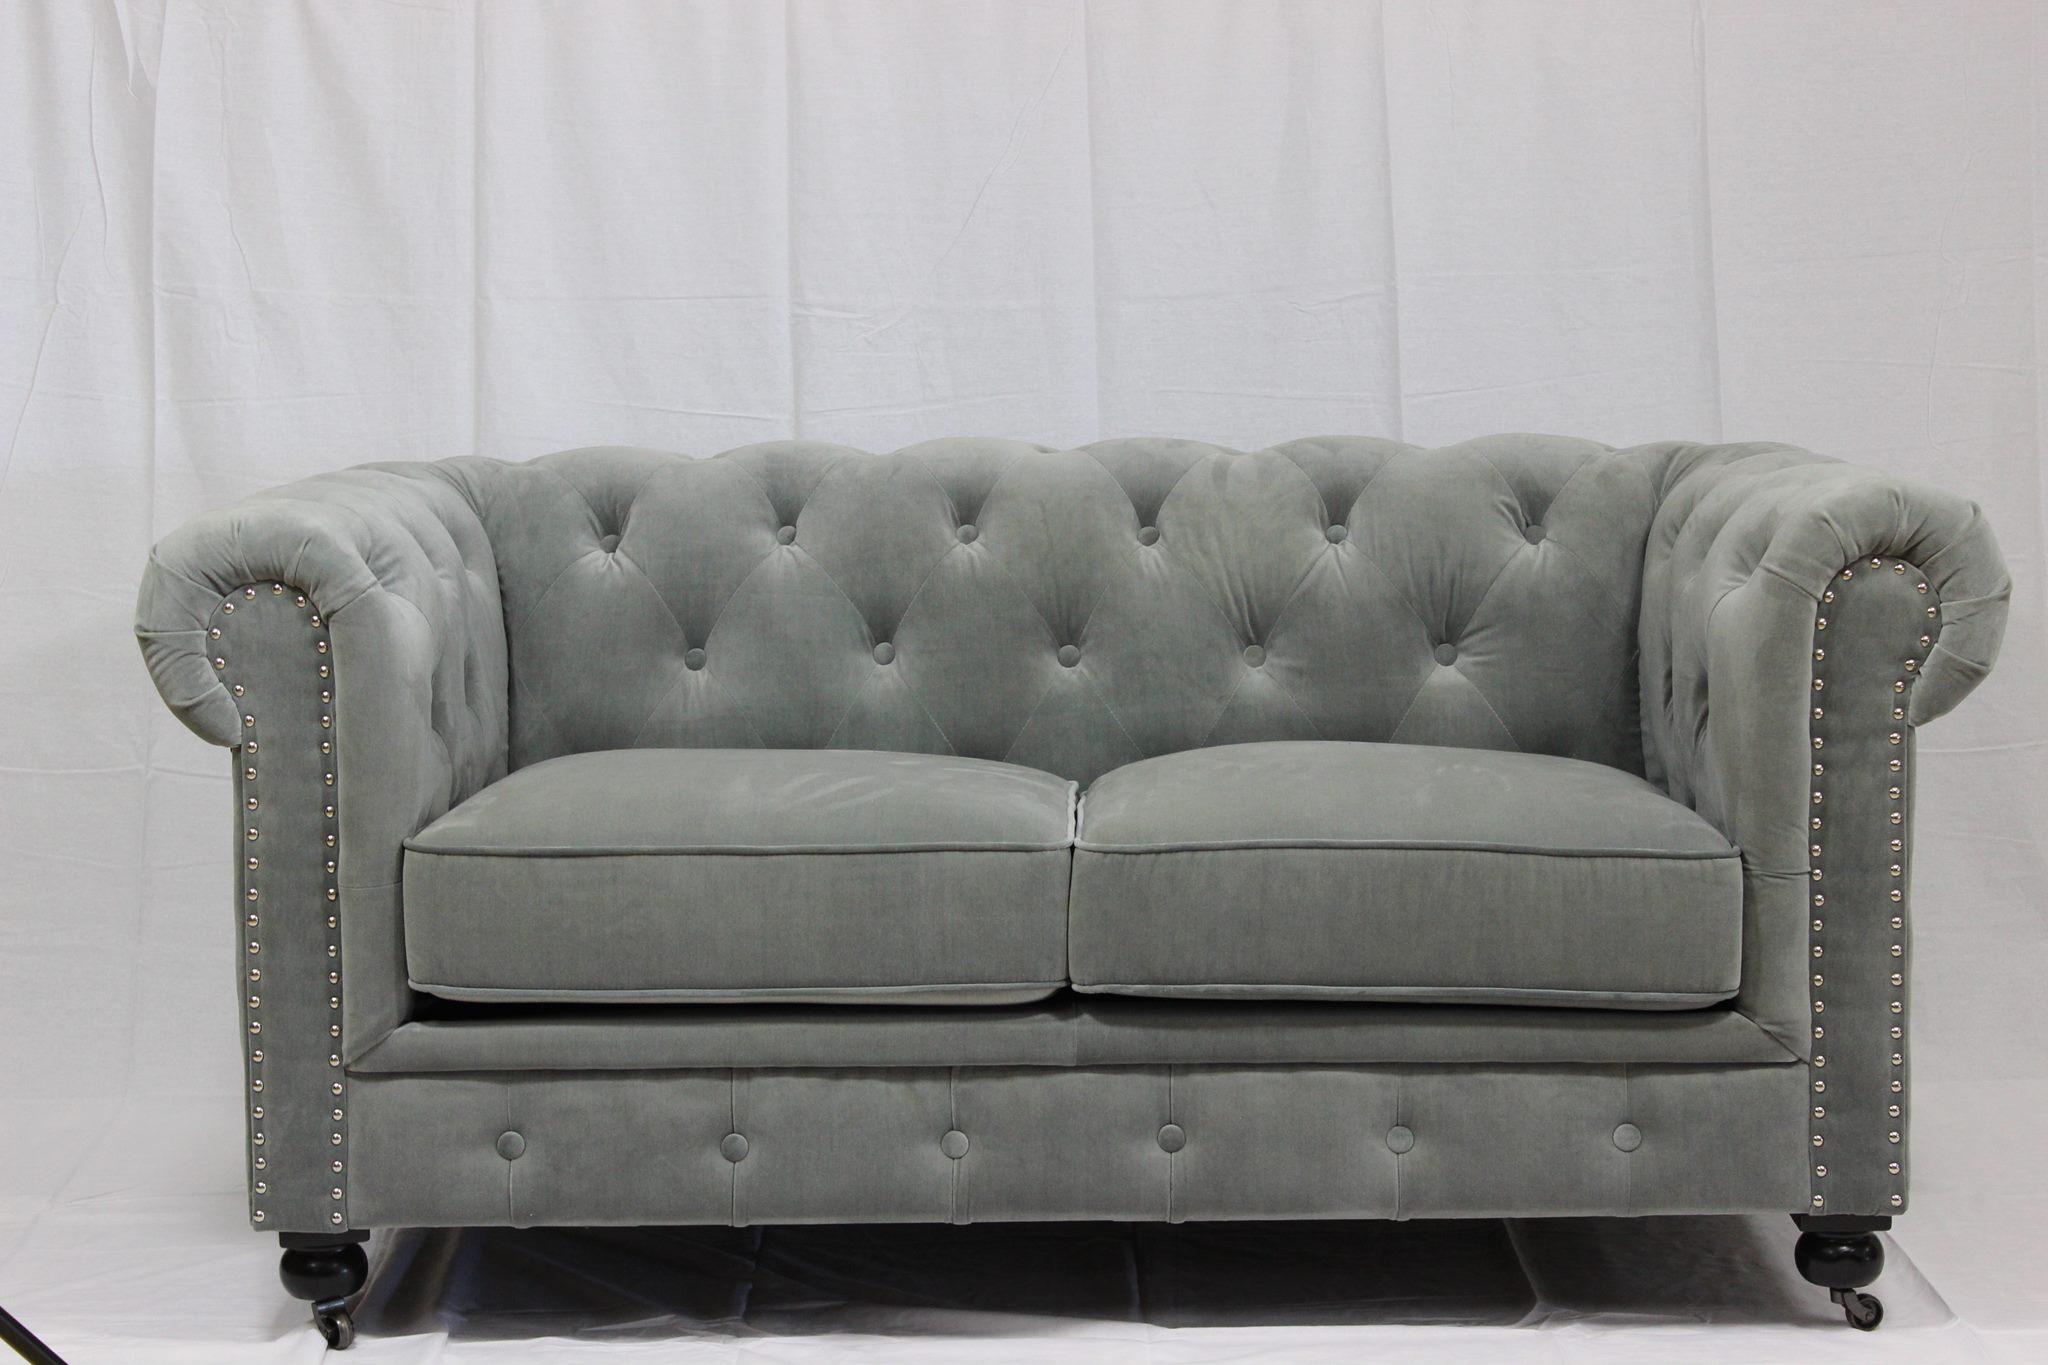 Astounding Tnc Chesterfield 2 Seater Sofa Gray Pdpeps Interior Chair Design Pdpepsorg